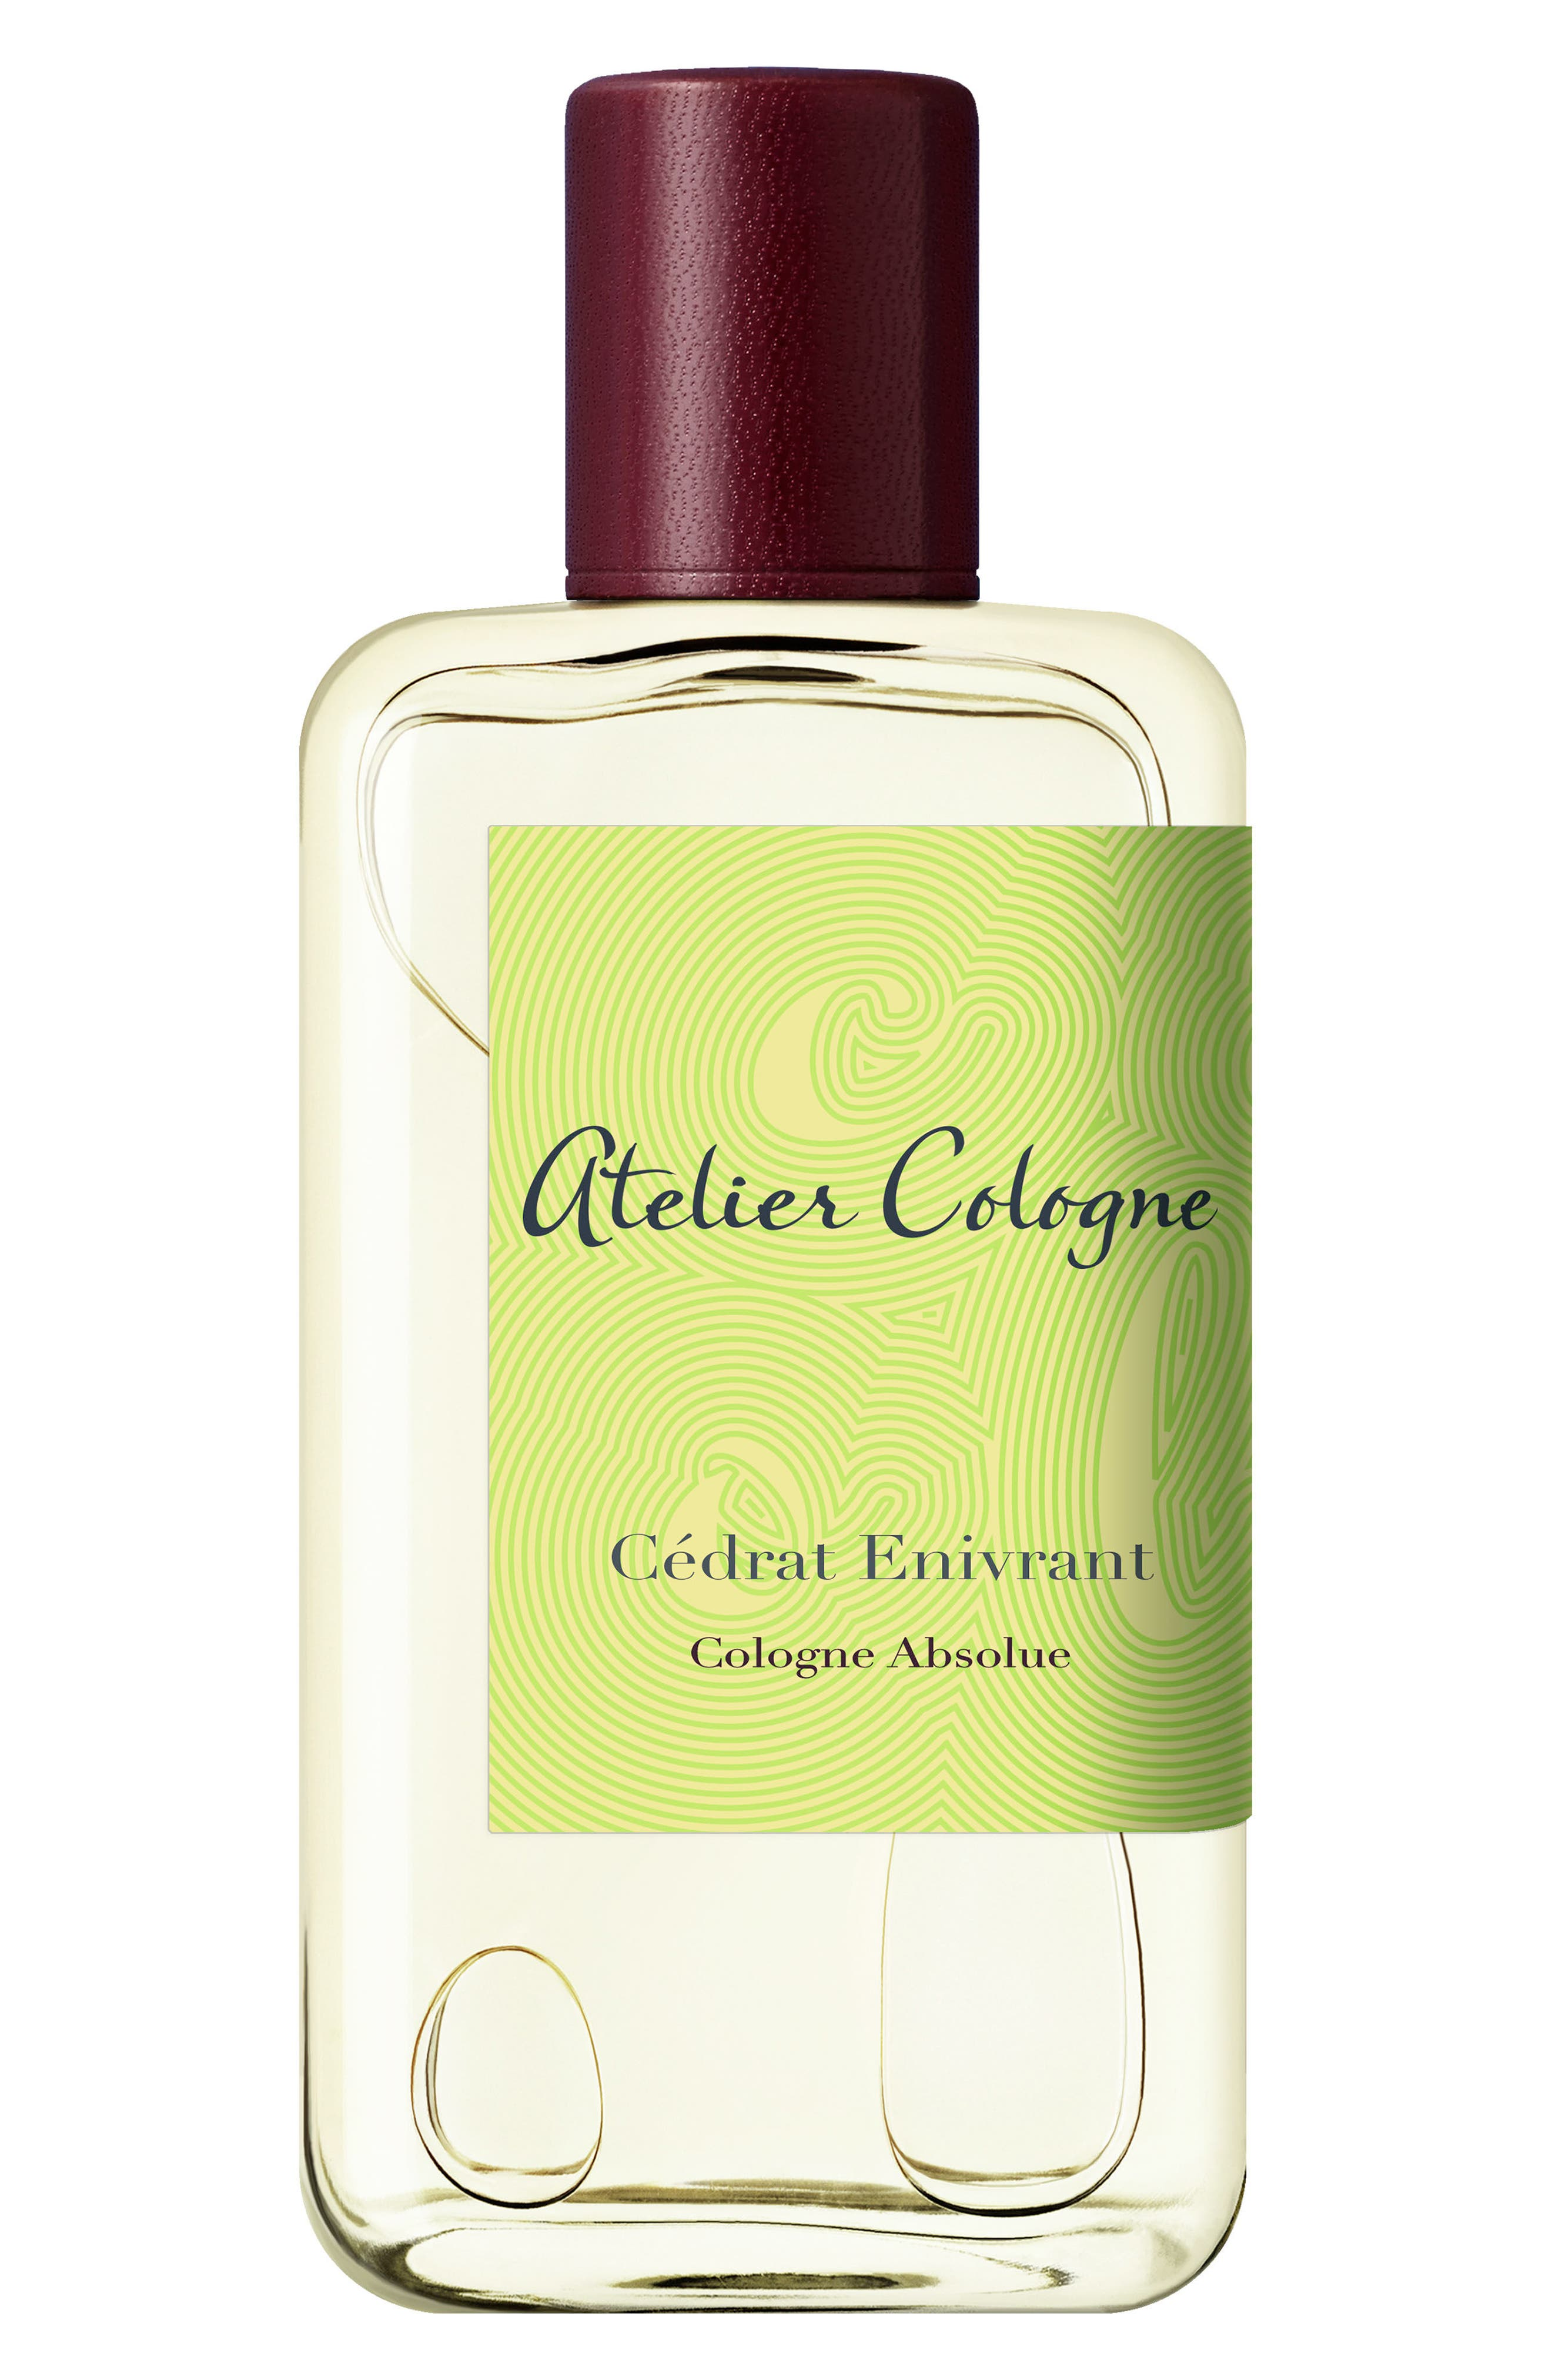 Atelier Cologne Cedrat Envirant Cologne Absolue